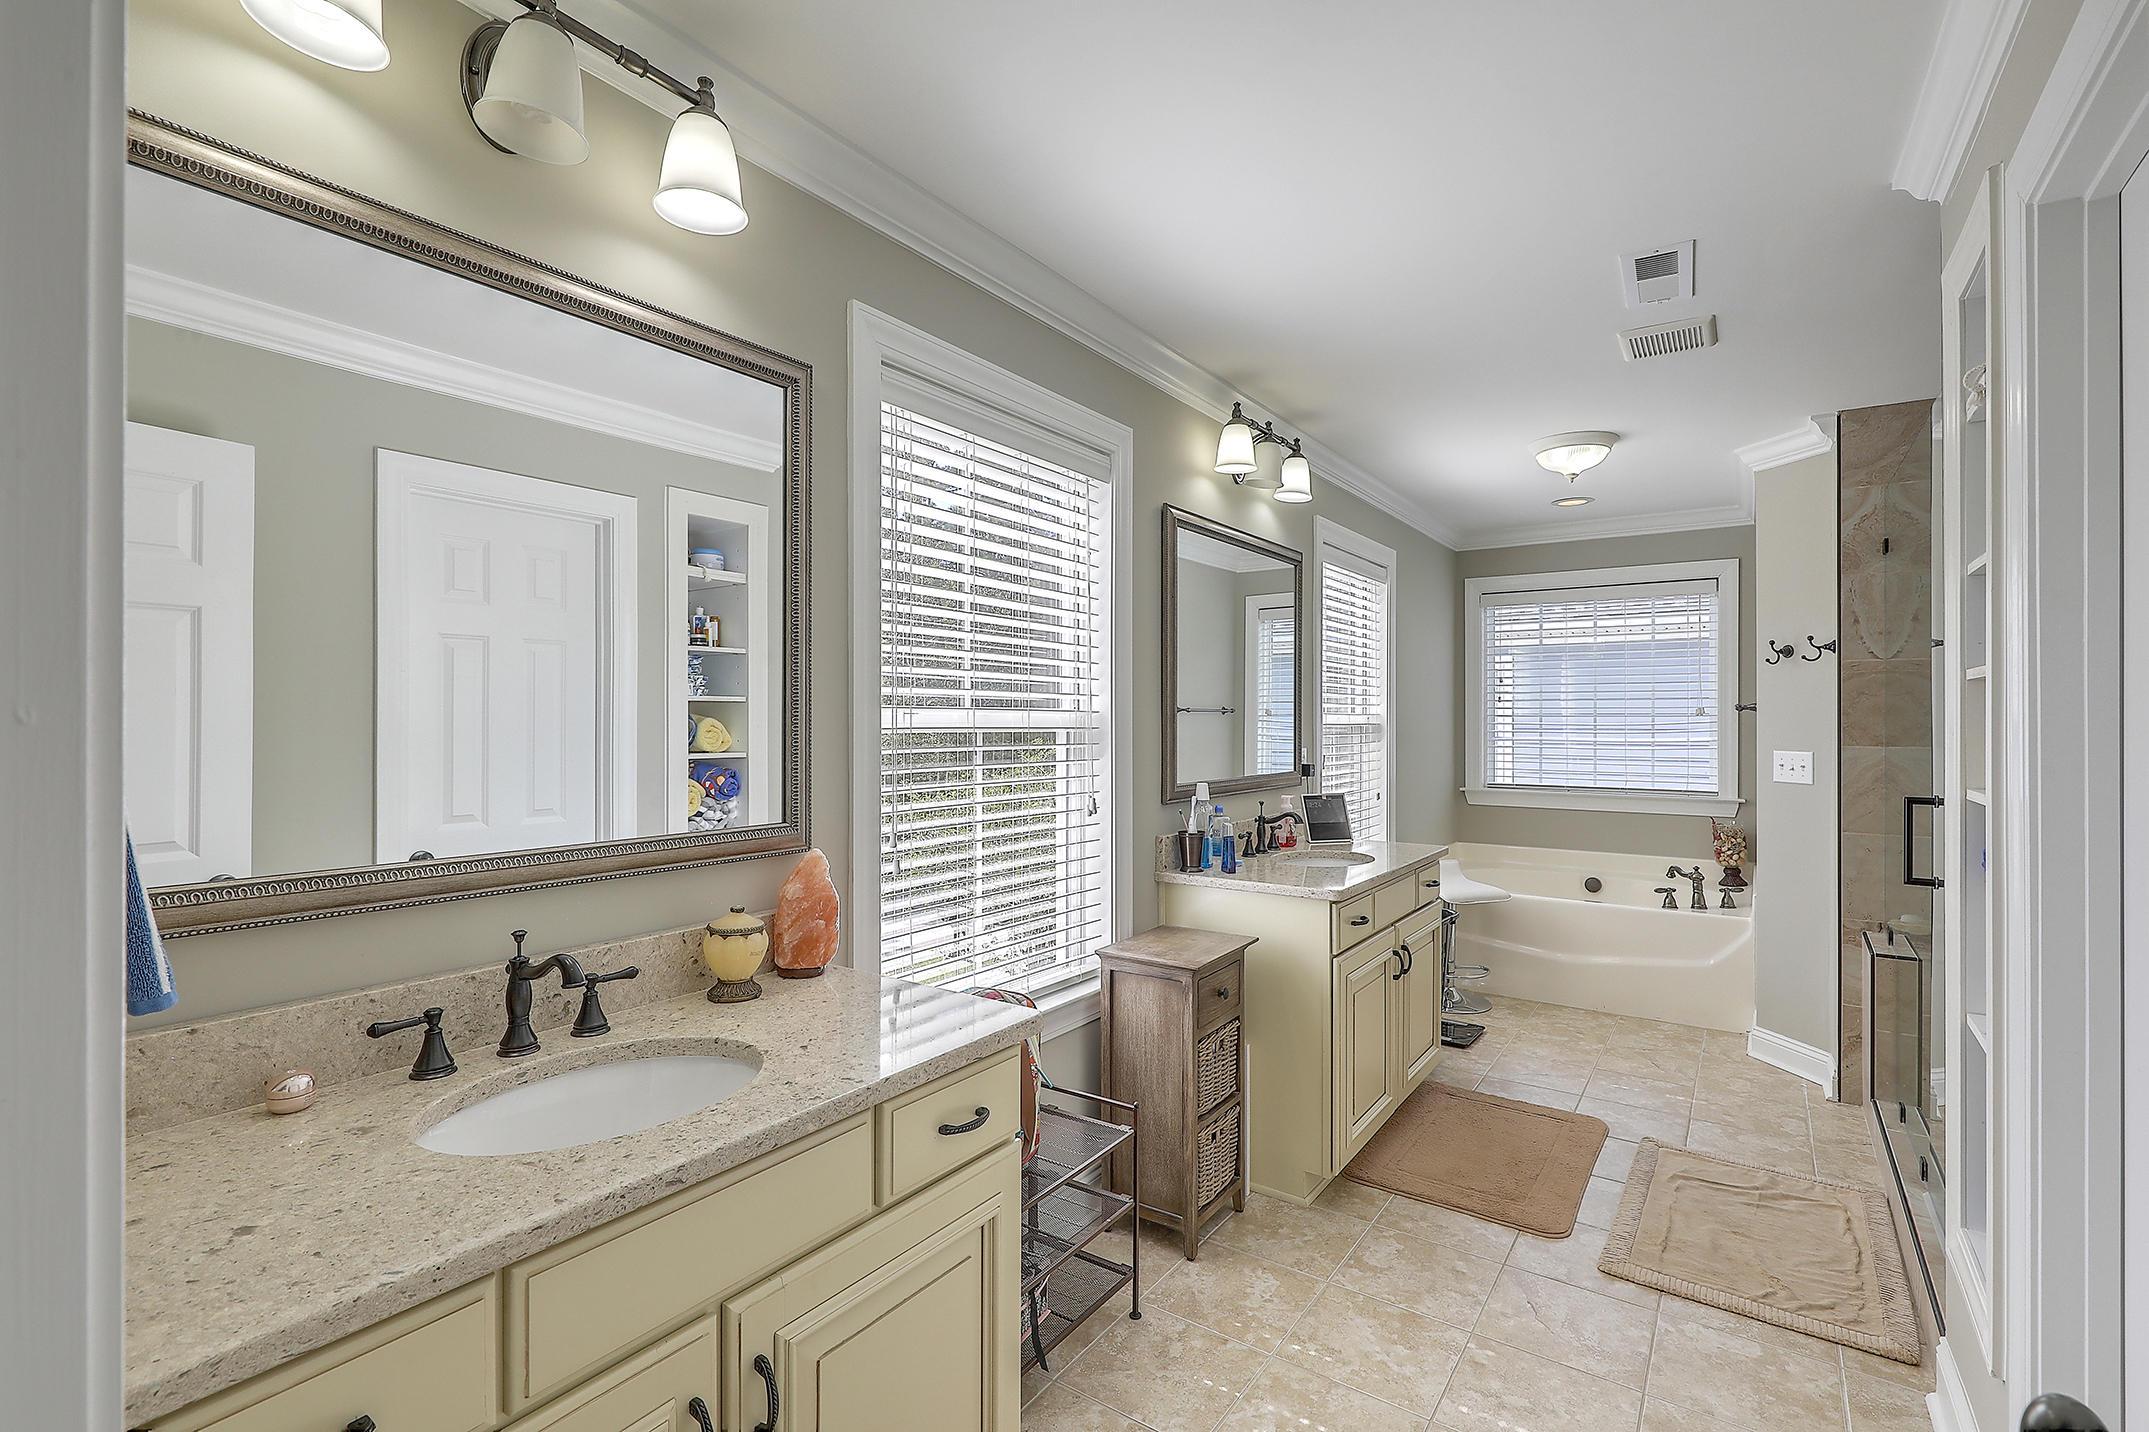 Branch Creek Homes For Sale - 304 Pond Hill, Summerville, SC - 21